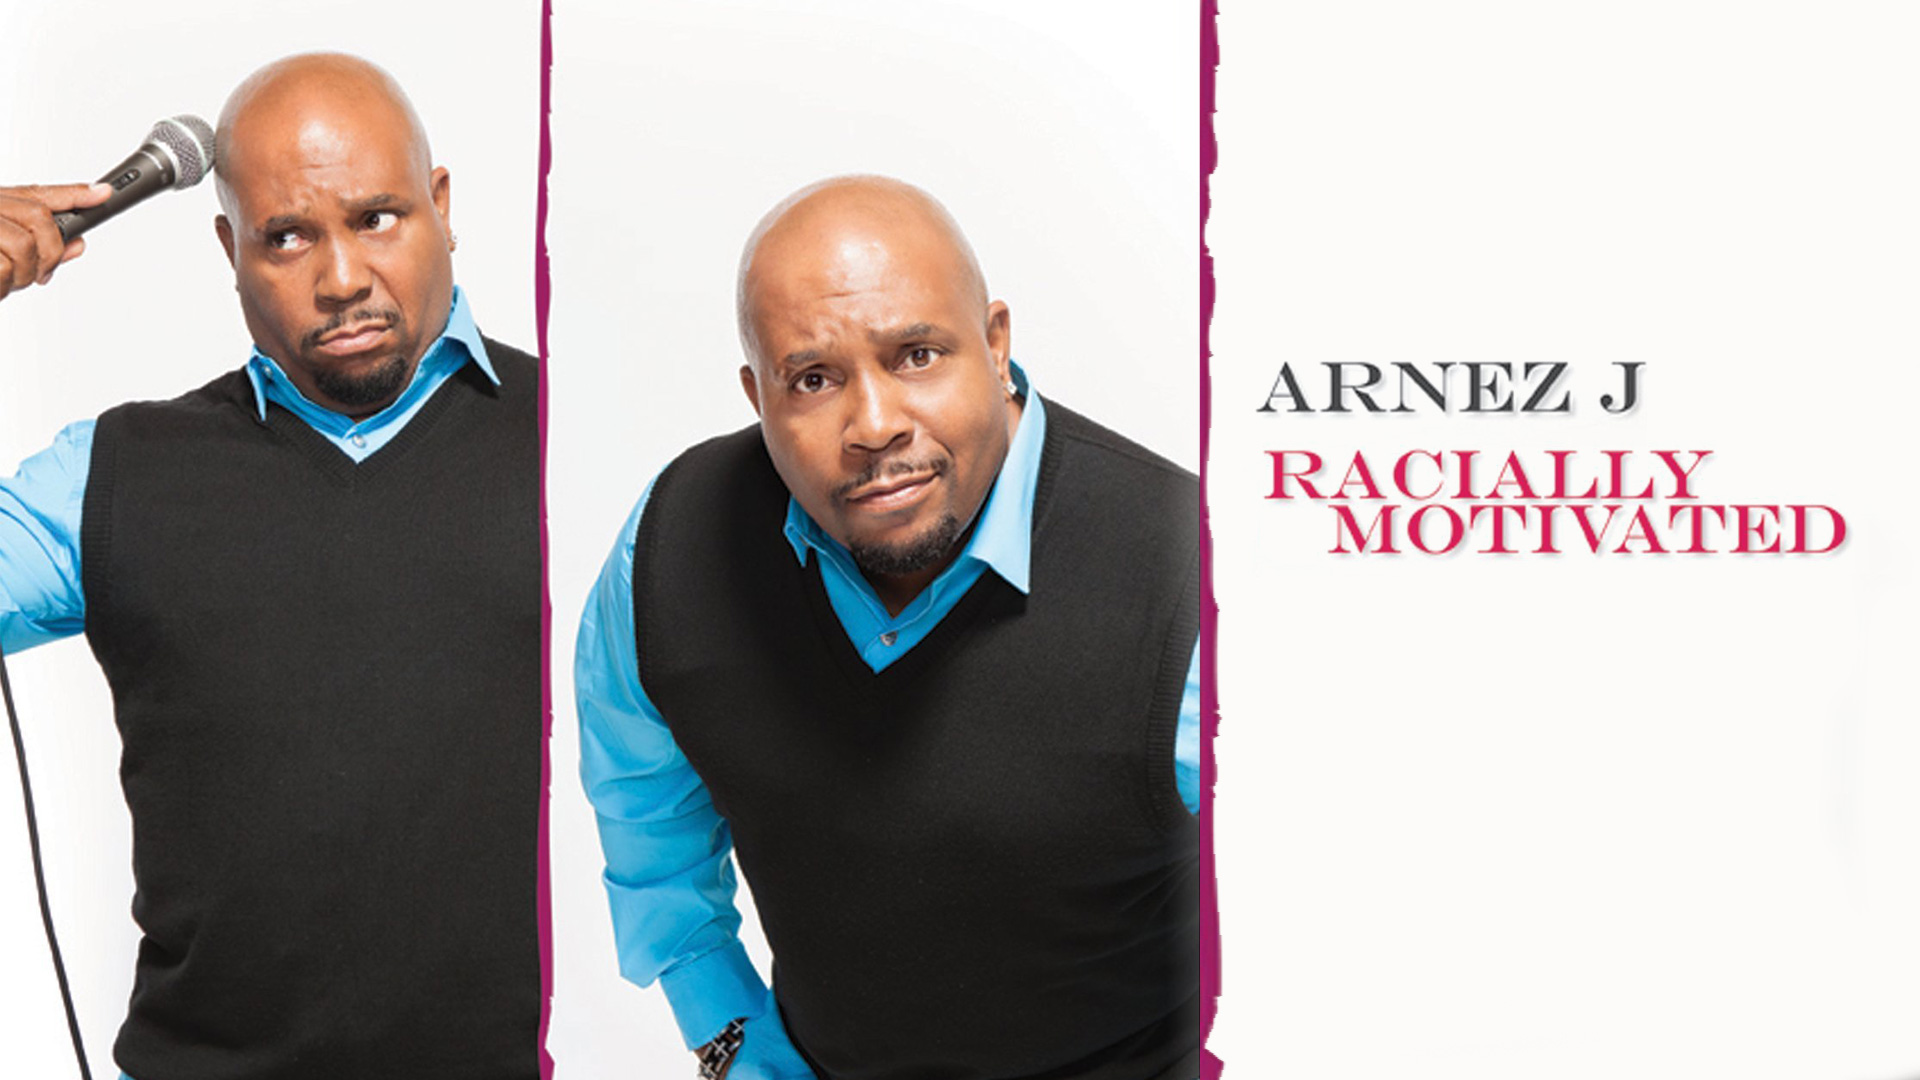 Arnez J: Racially Motivated